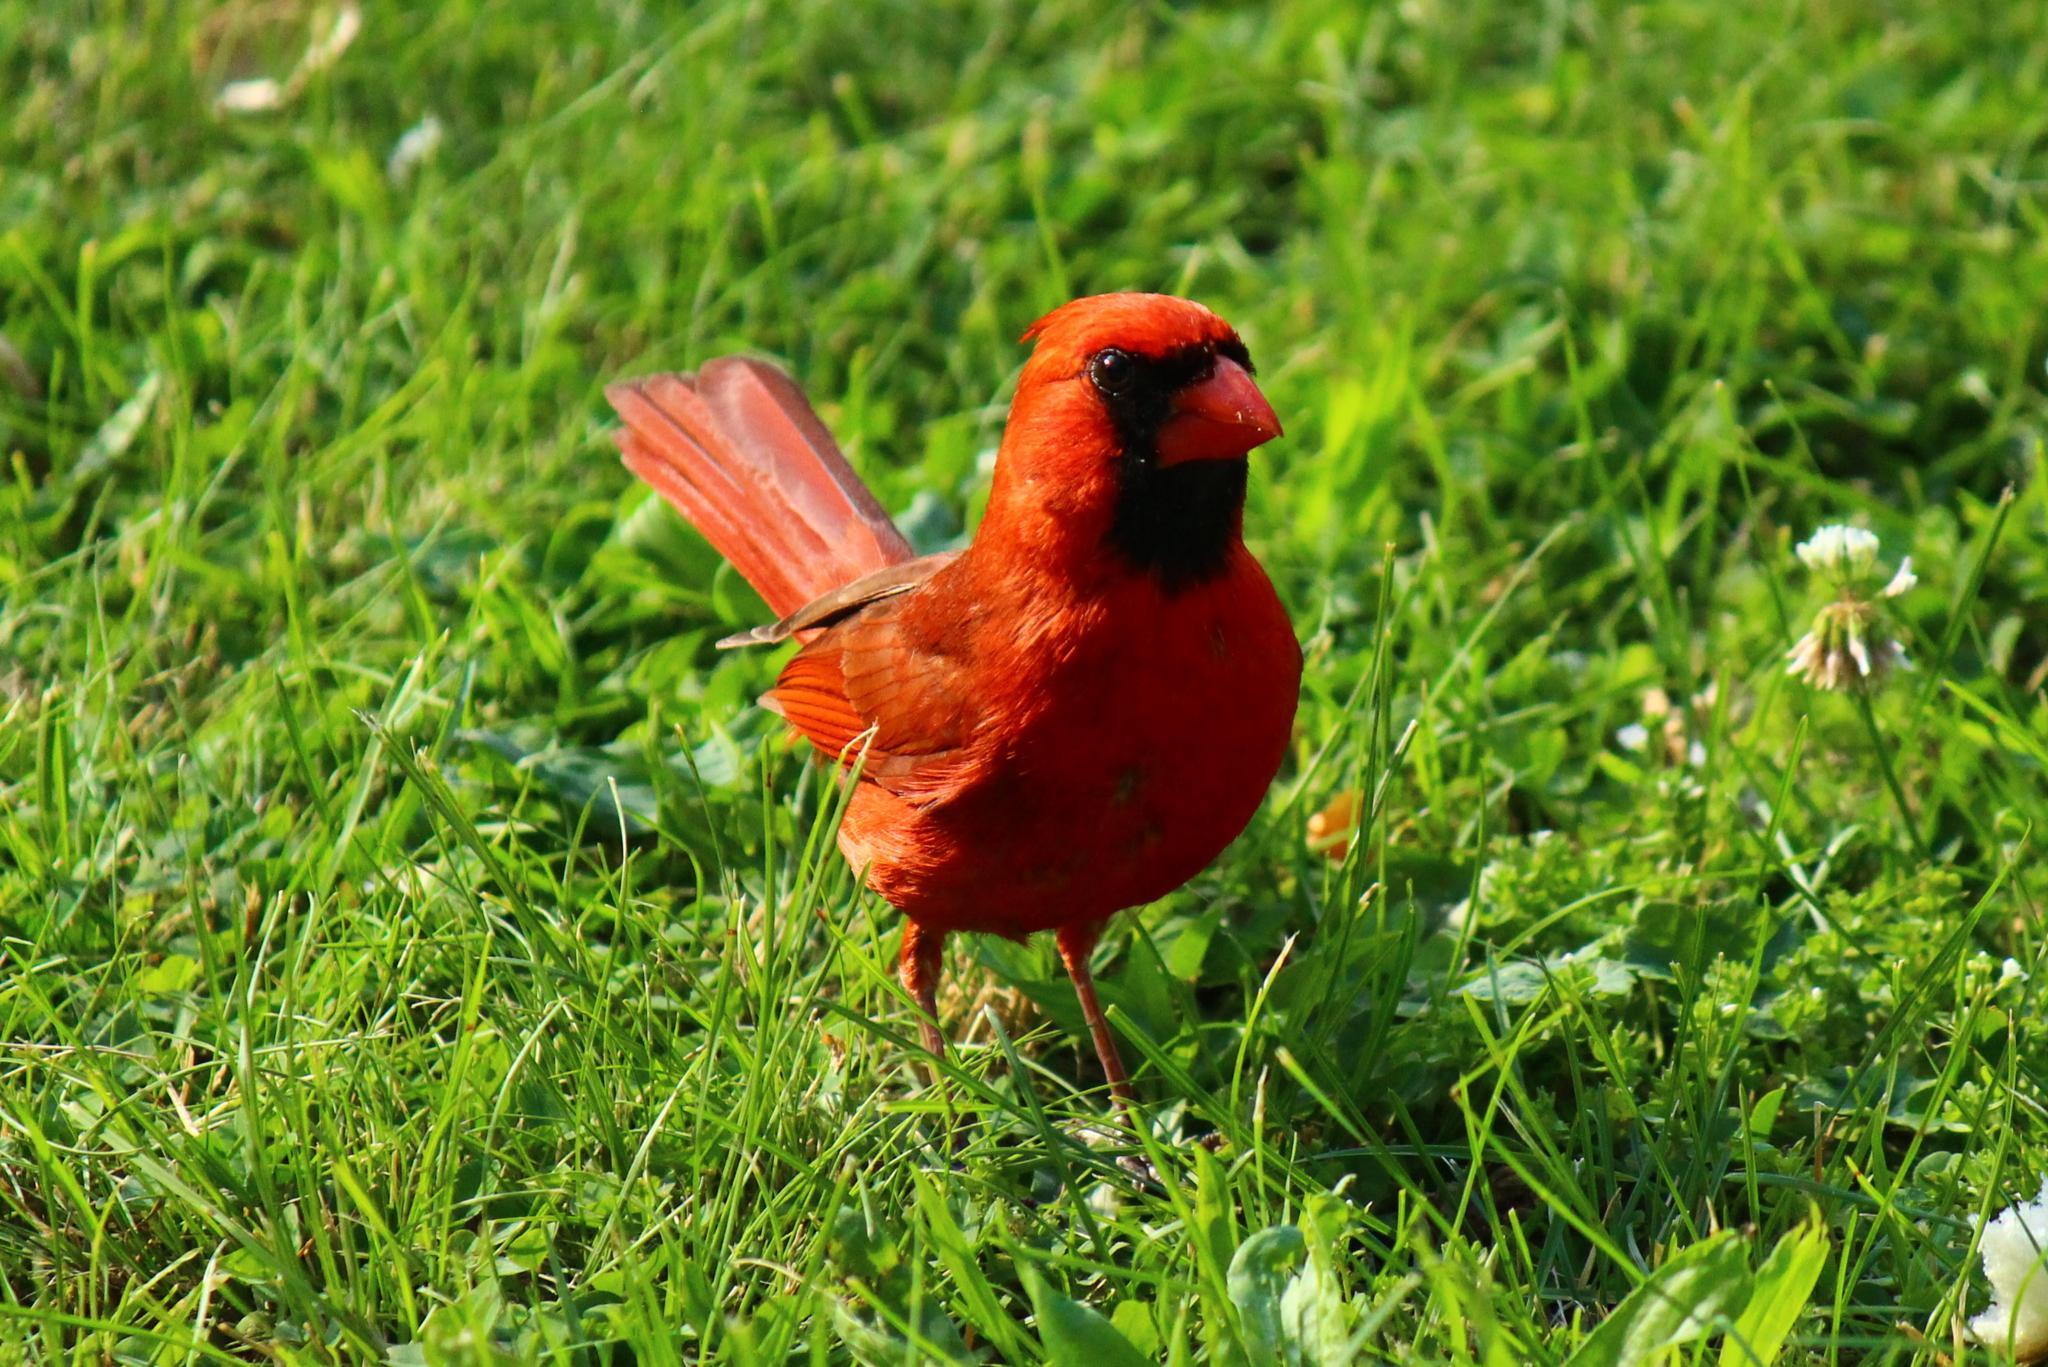 King cardinal by Clark L. Roberts